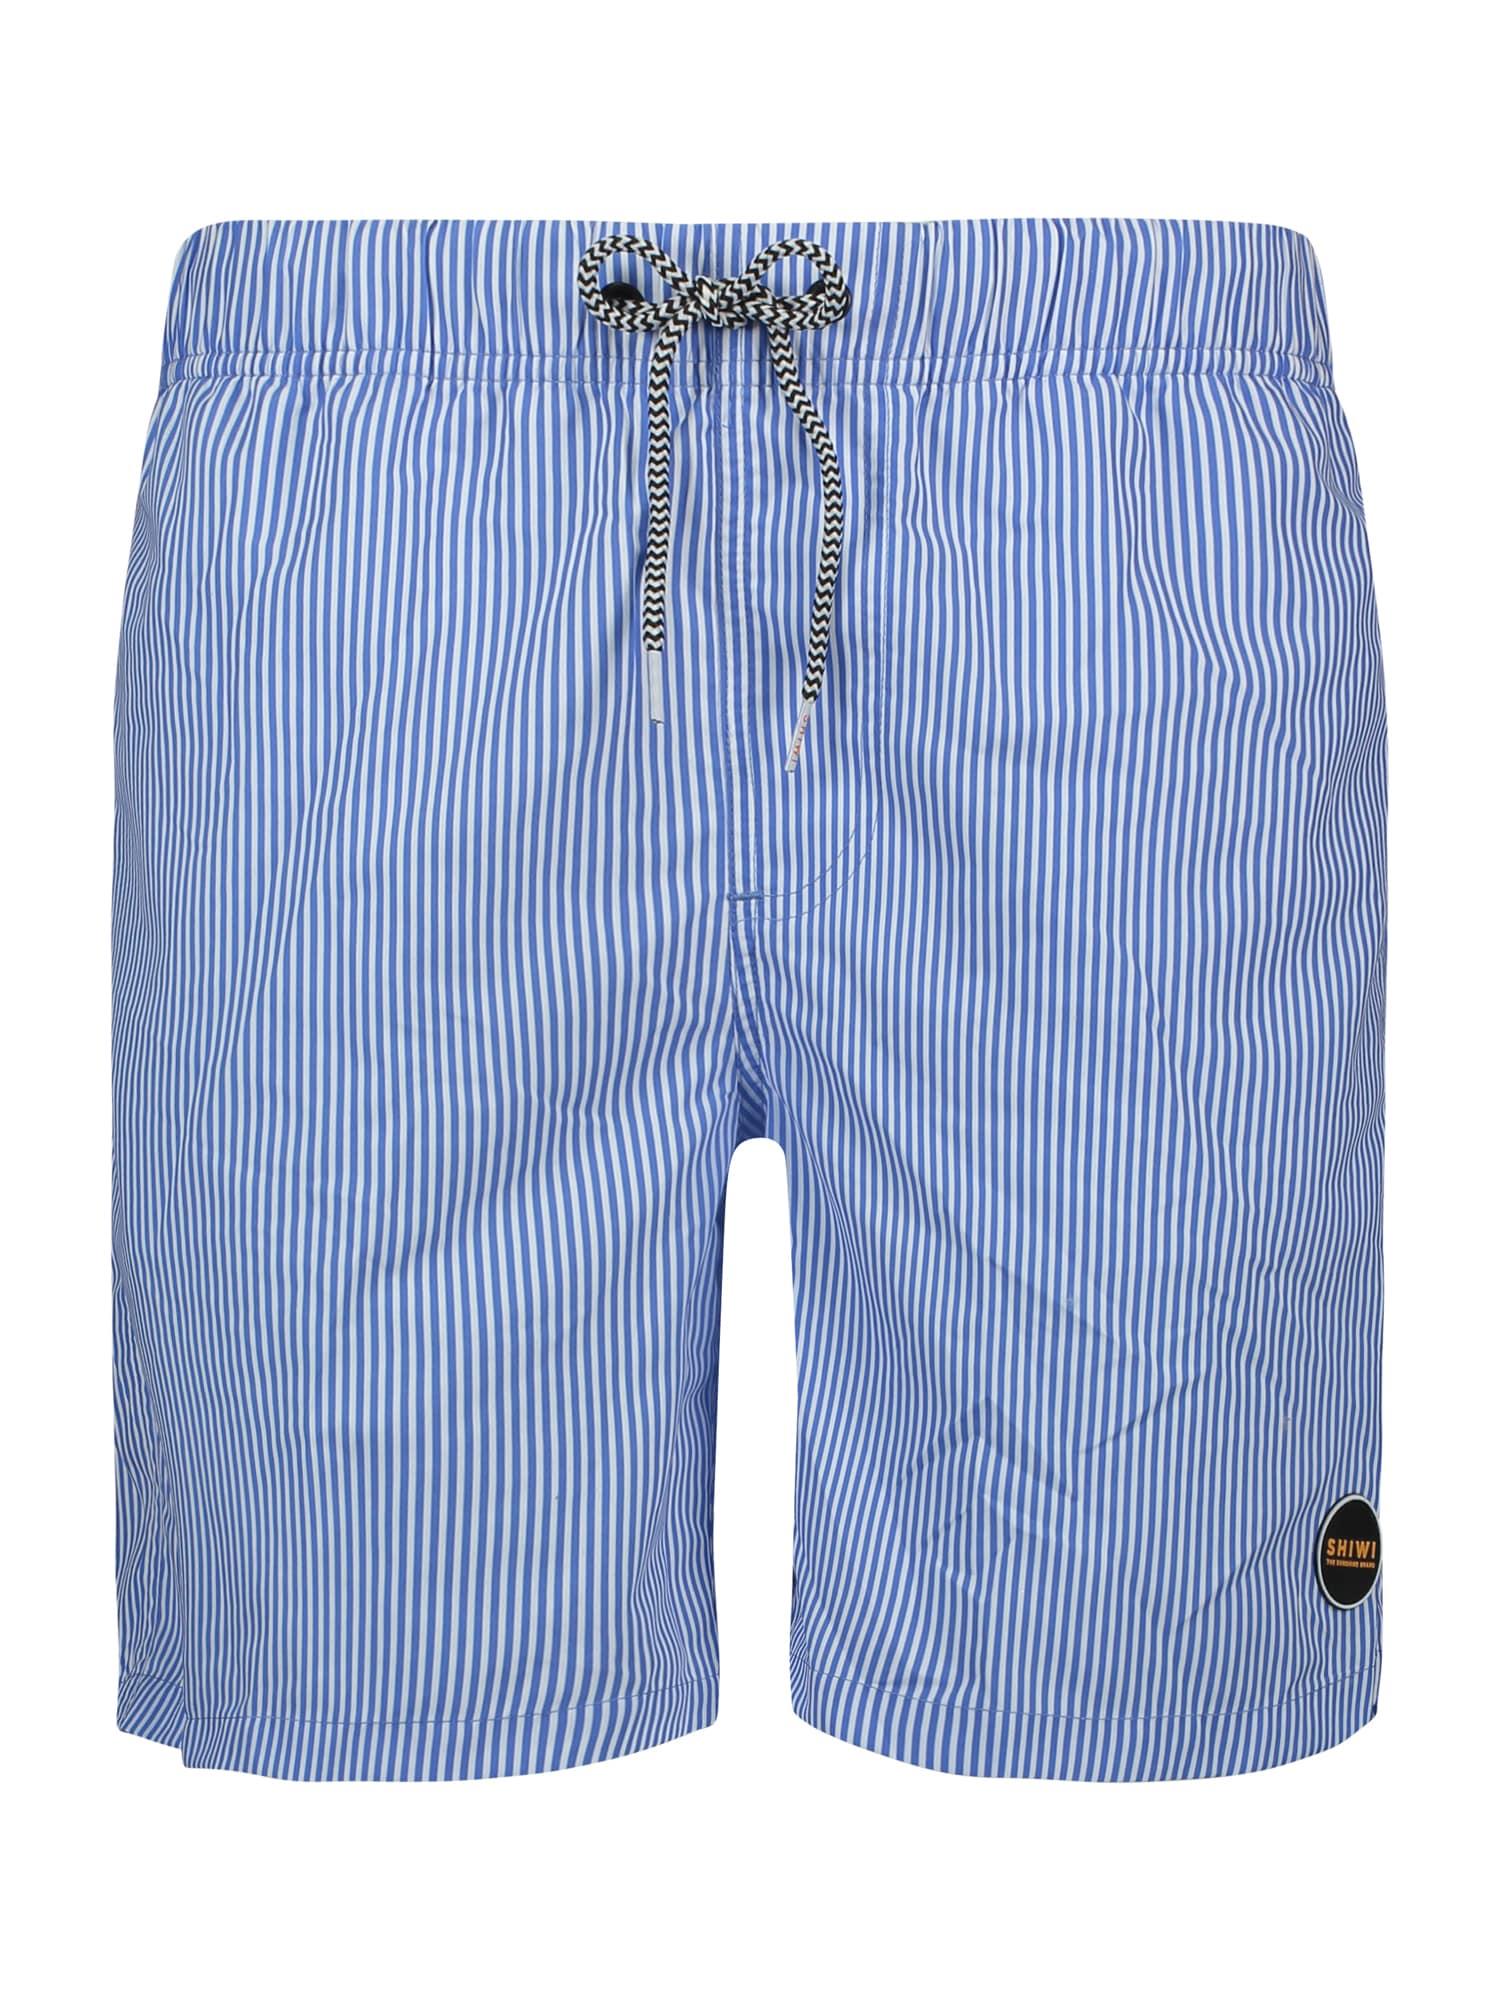 Shiwi Plavky 'Skinny stripe'  modré